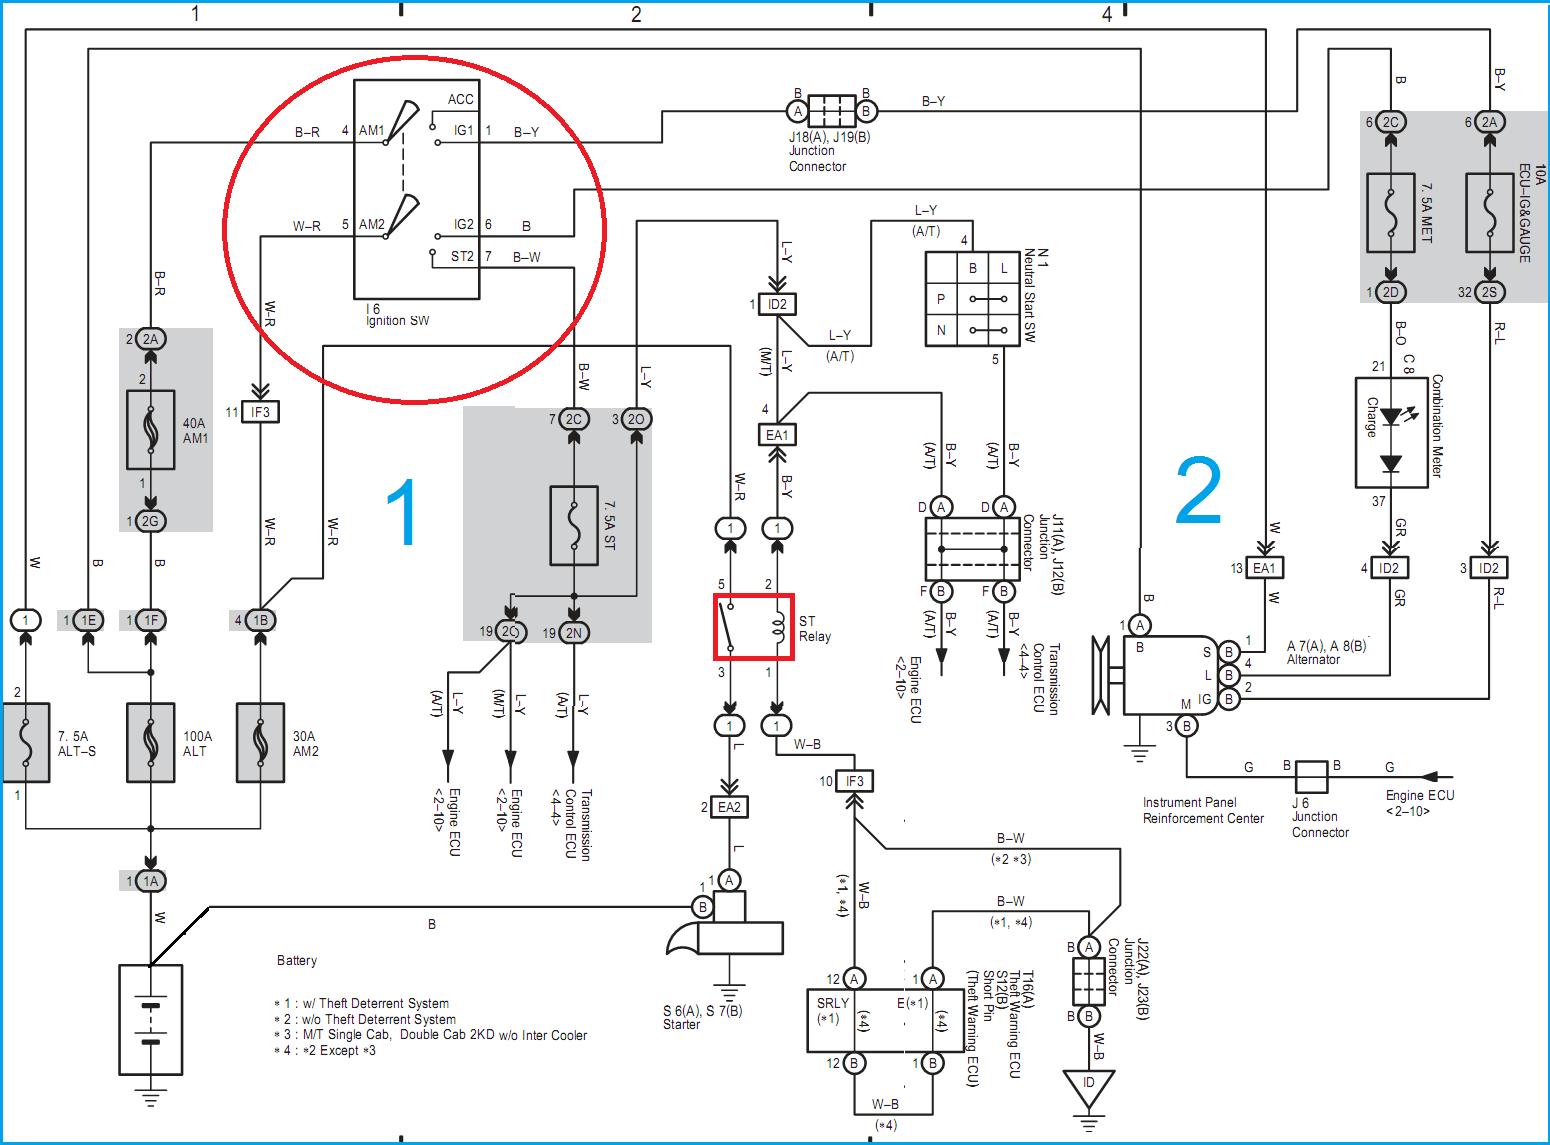 DIAGRAM] Hilux Revo Wiring Diagram FULL Version HD Quality Wiring Diagram -  SHAREDIAGRAMS.NUITDEBOUTAIX.FRsharediagrams.nuitdeboutaix.fr